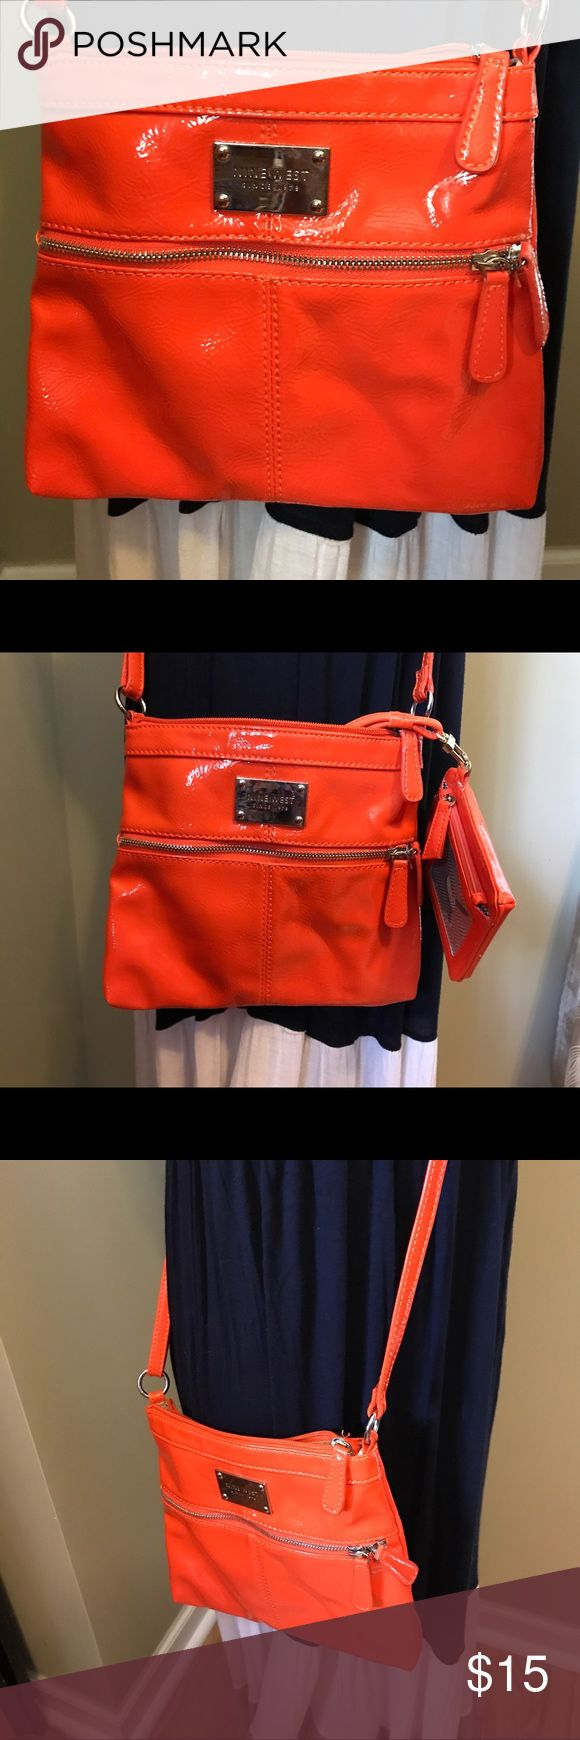 Nine West Purse Nine West purse with phone wallet. EUC Nine West Bags Crossbody Bags